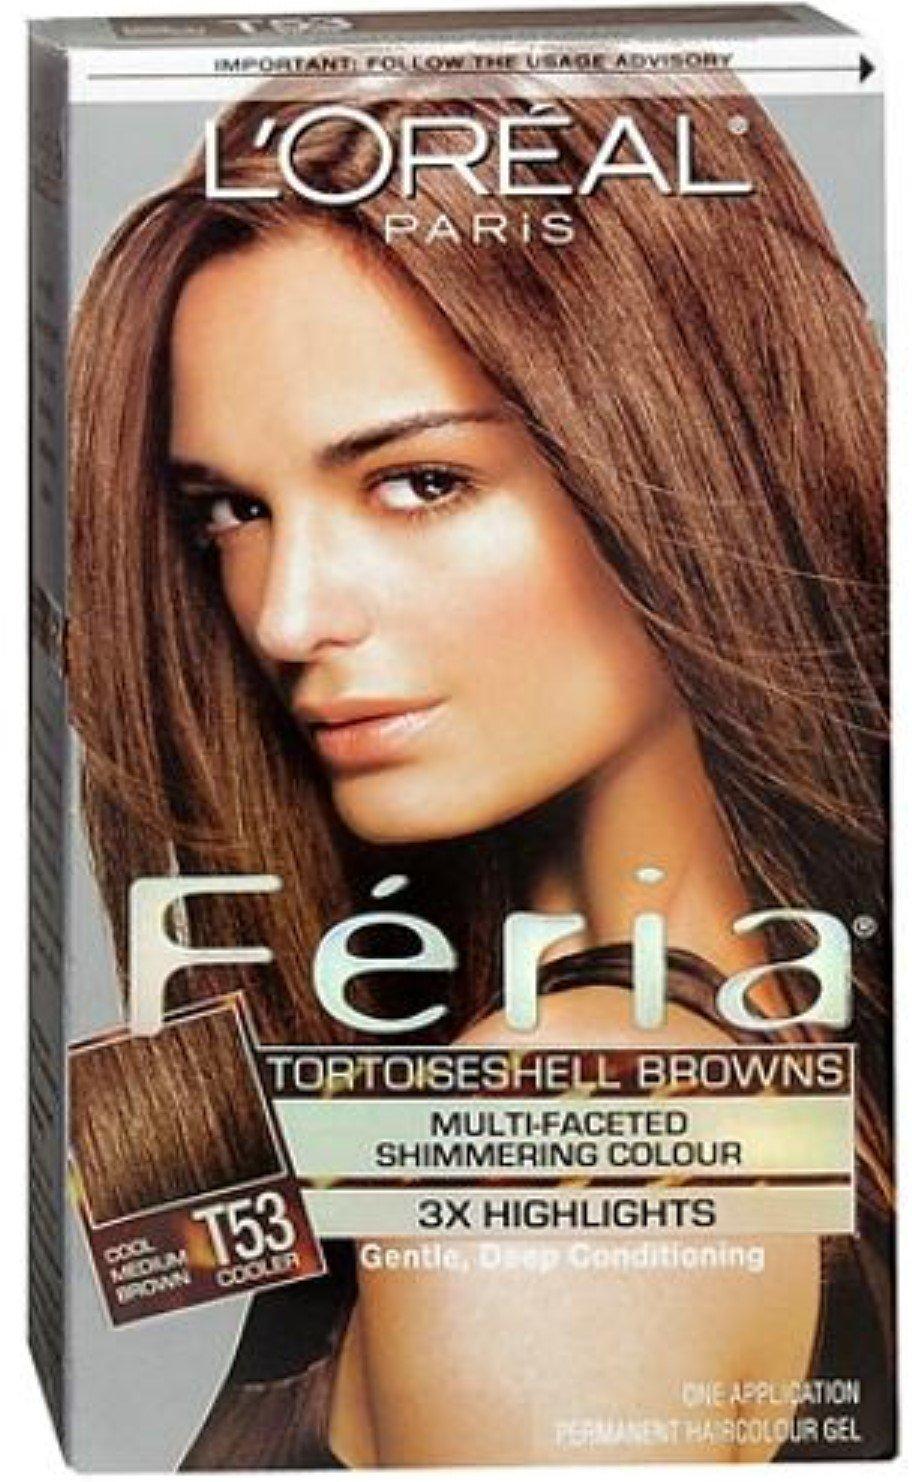 L'Oreal Paris Feria Multi-Faceted Shimmering Color, Cool Medium Brown [T53] 1 ea (Pack of 6) by L'Oreal Paris